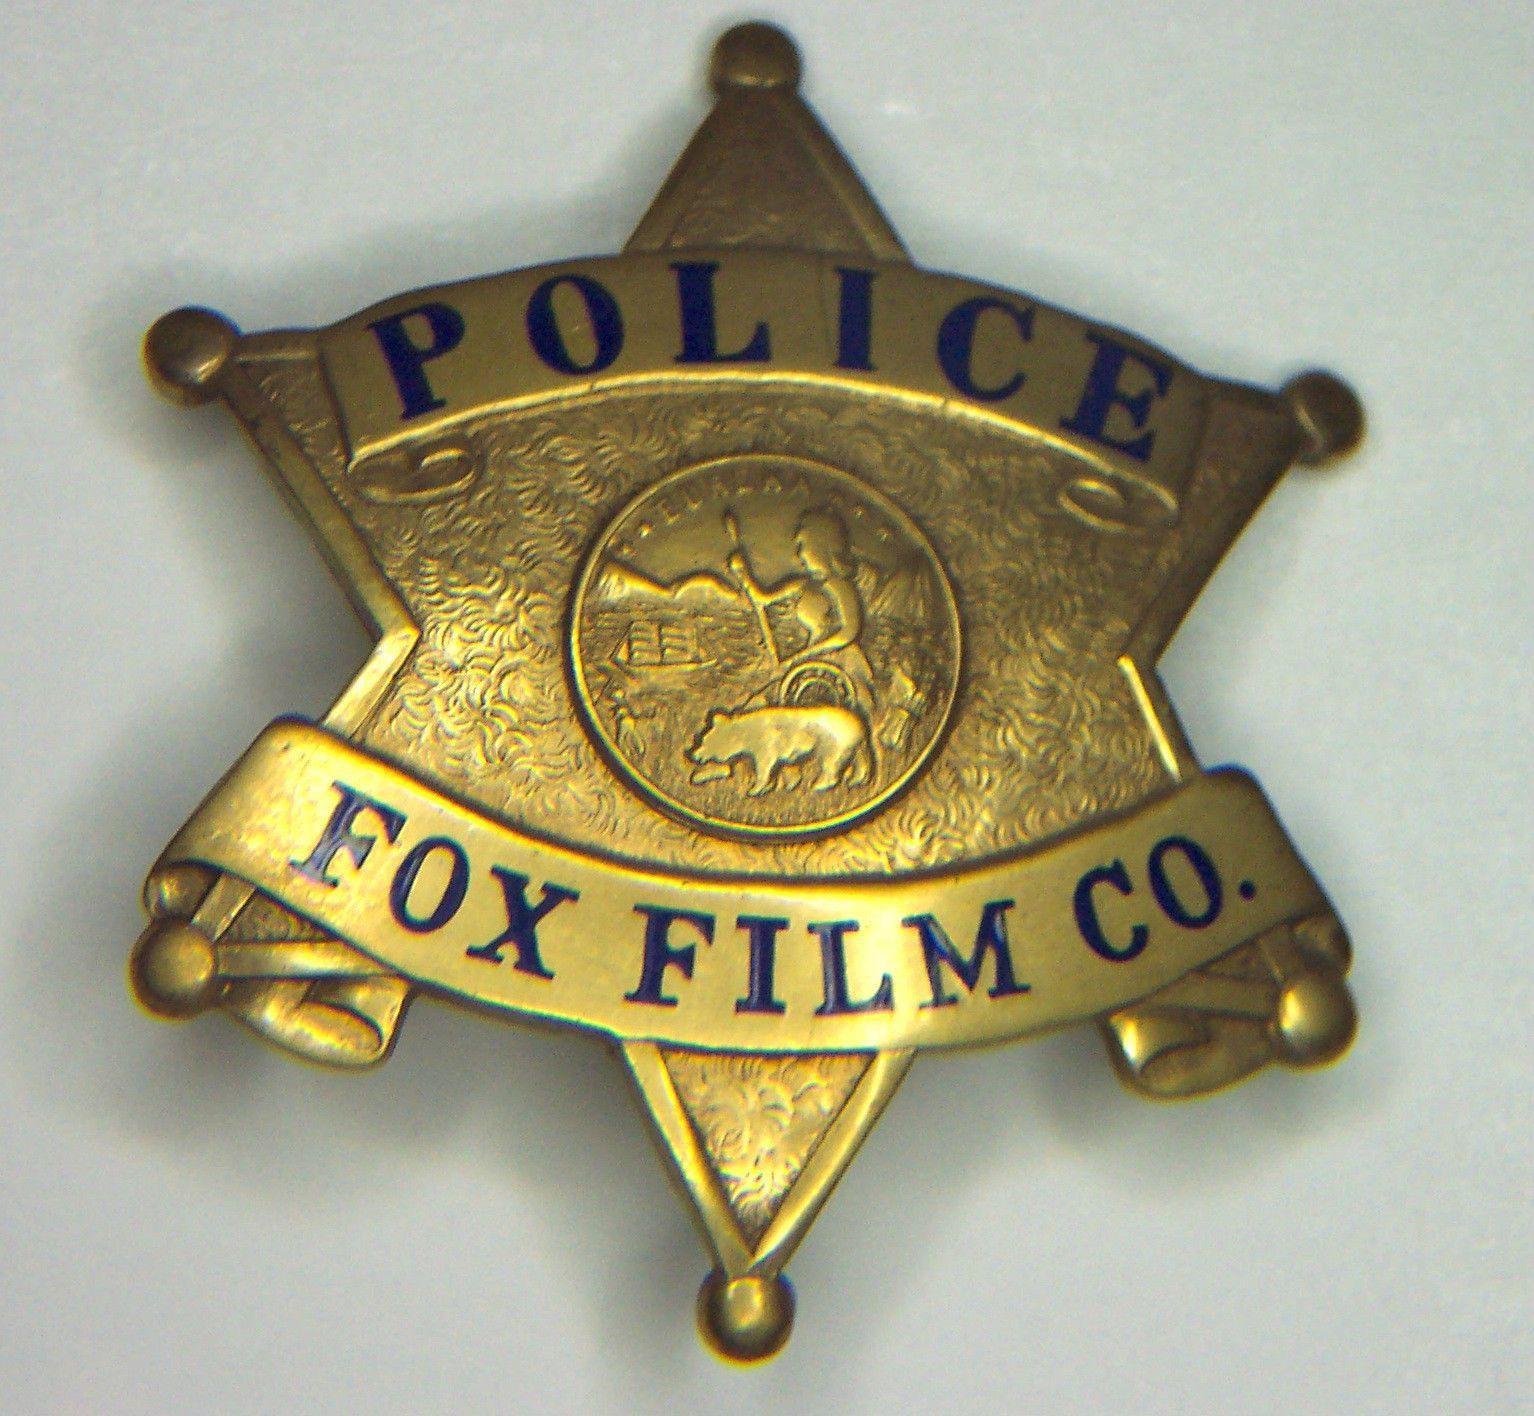 FOX FILM CO. Hollywood Movie STUDIO Vintage 30's POLICE